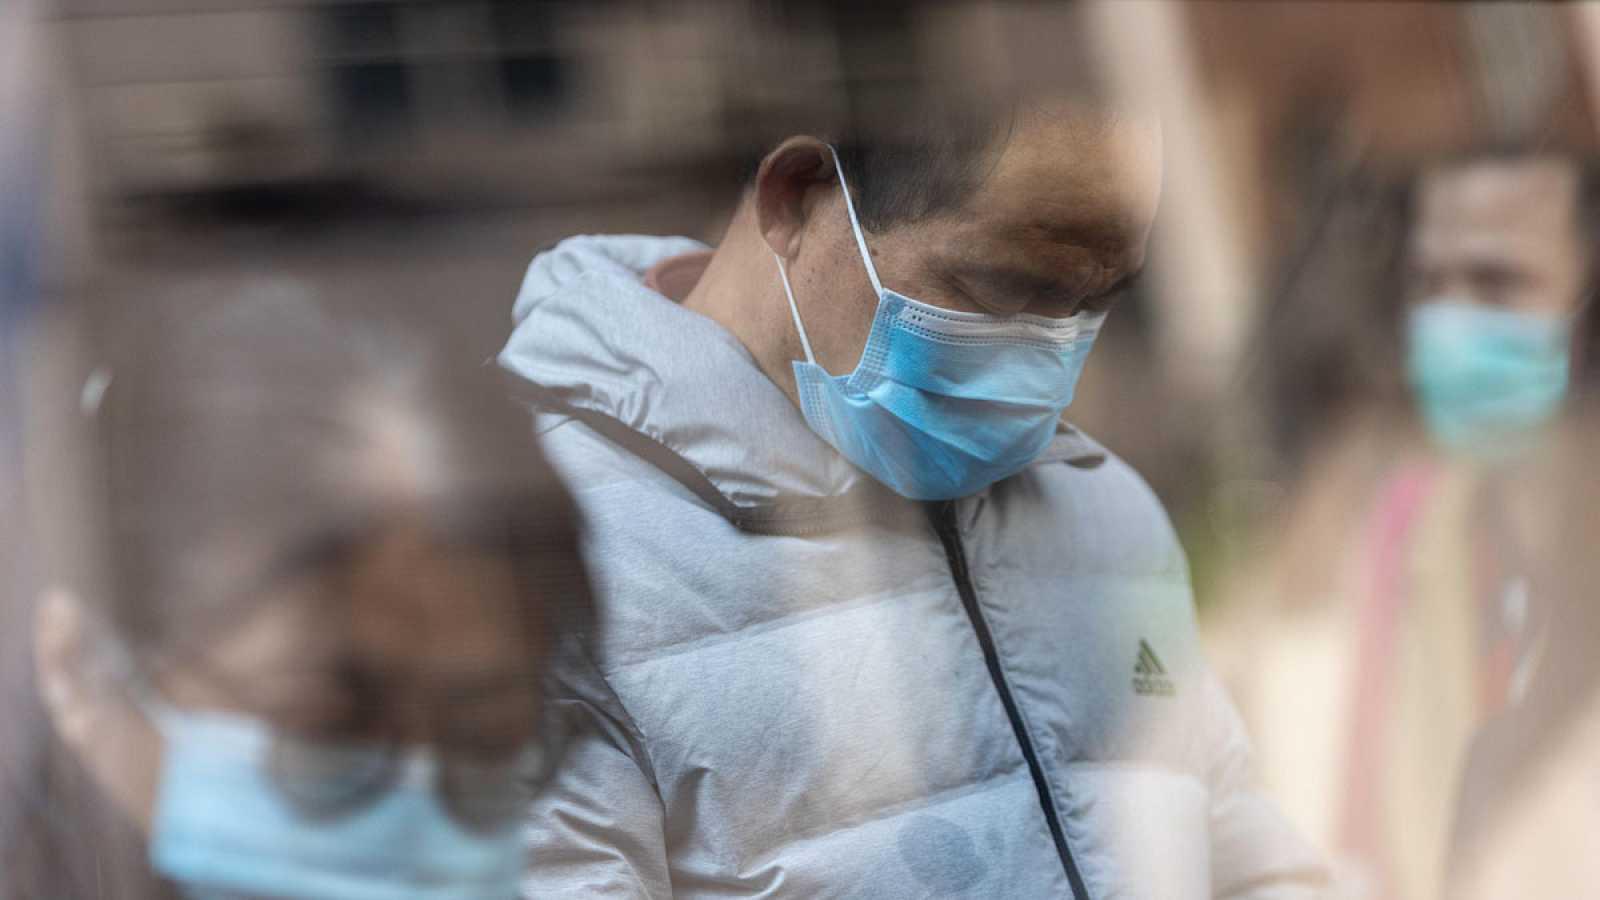 China-is-making-efforts-to-localize-the-coronavirus